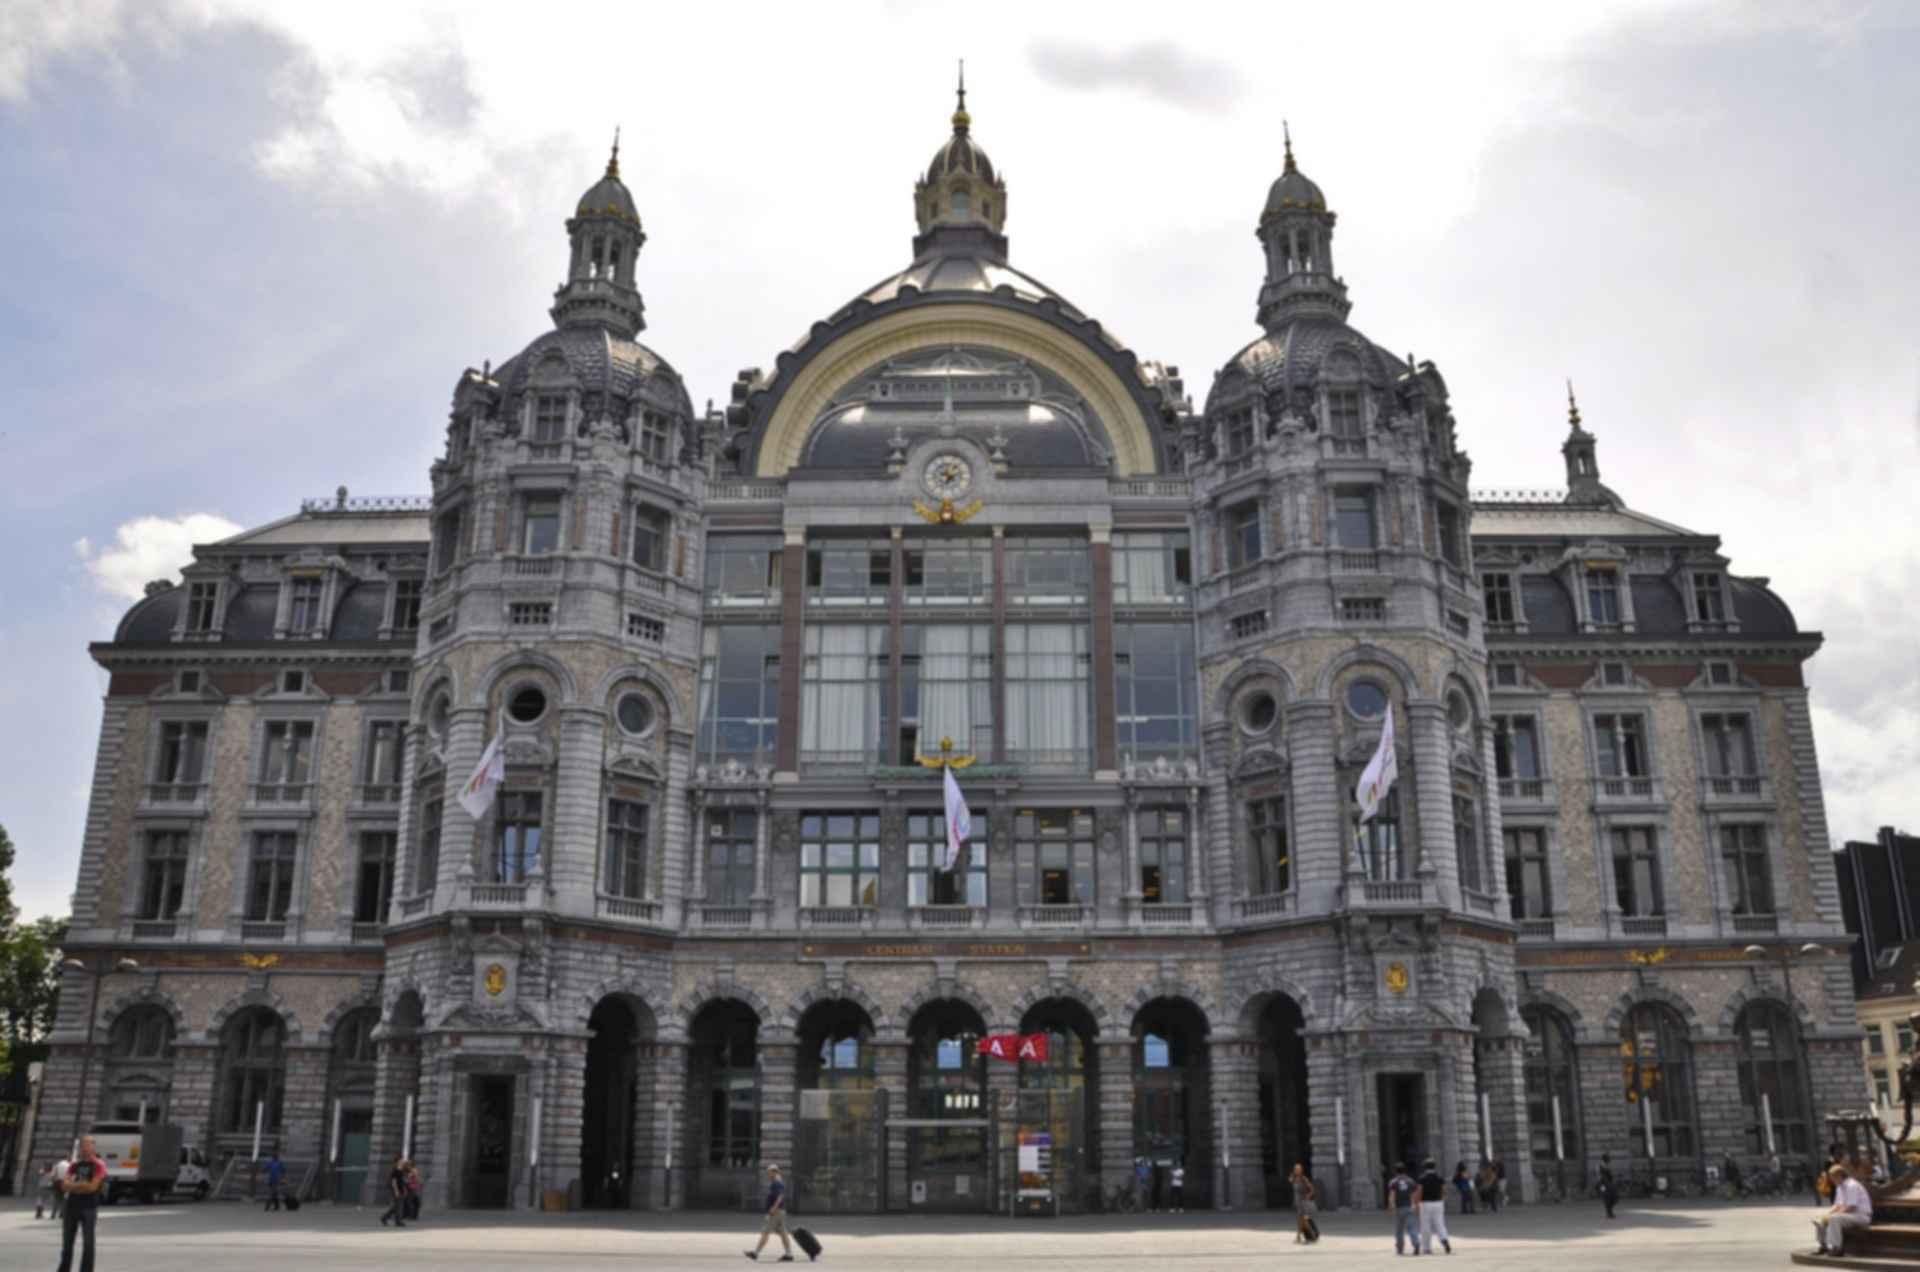 Antwerpen-Centraal Station - Exterior/front